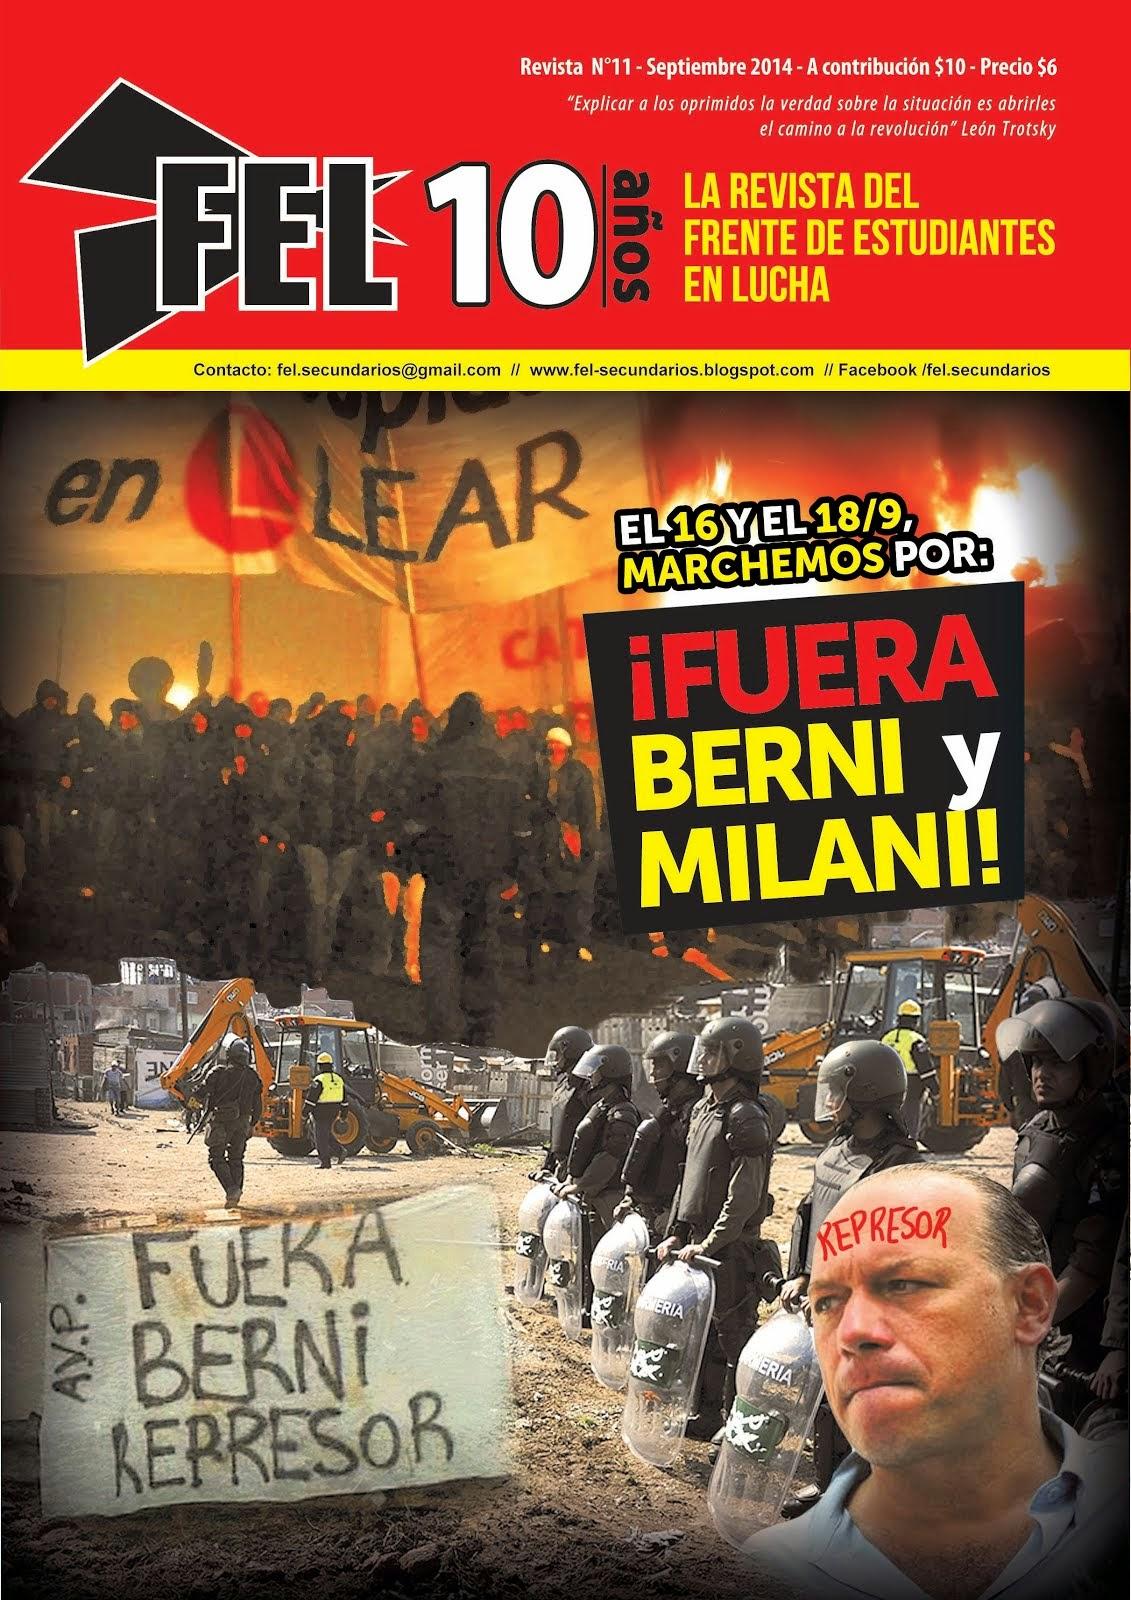 REVISTA DEL FEL N°11 - ¡FUERA BERNI Y MILANI!